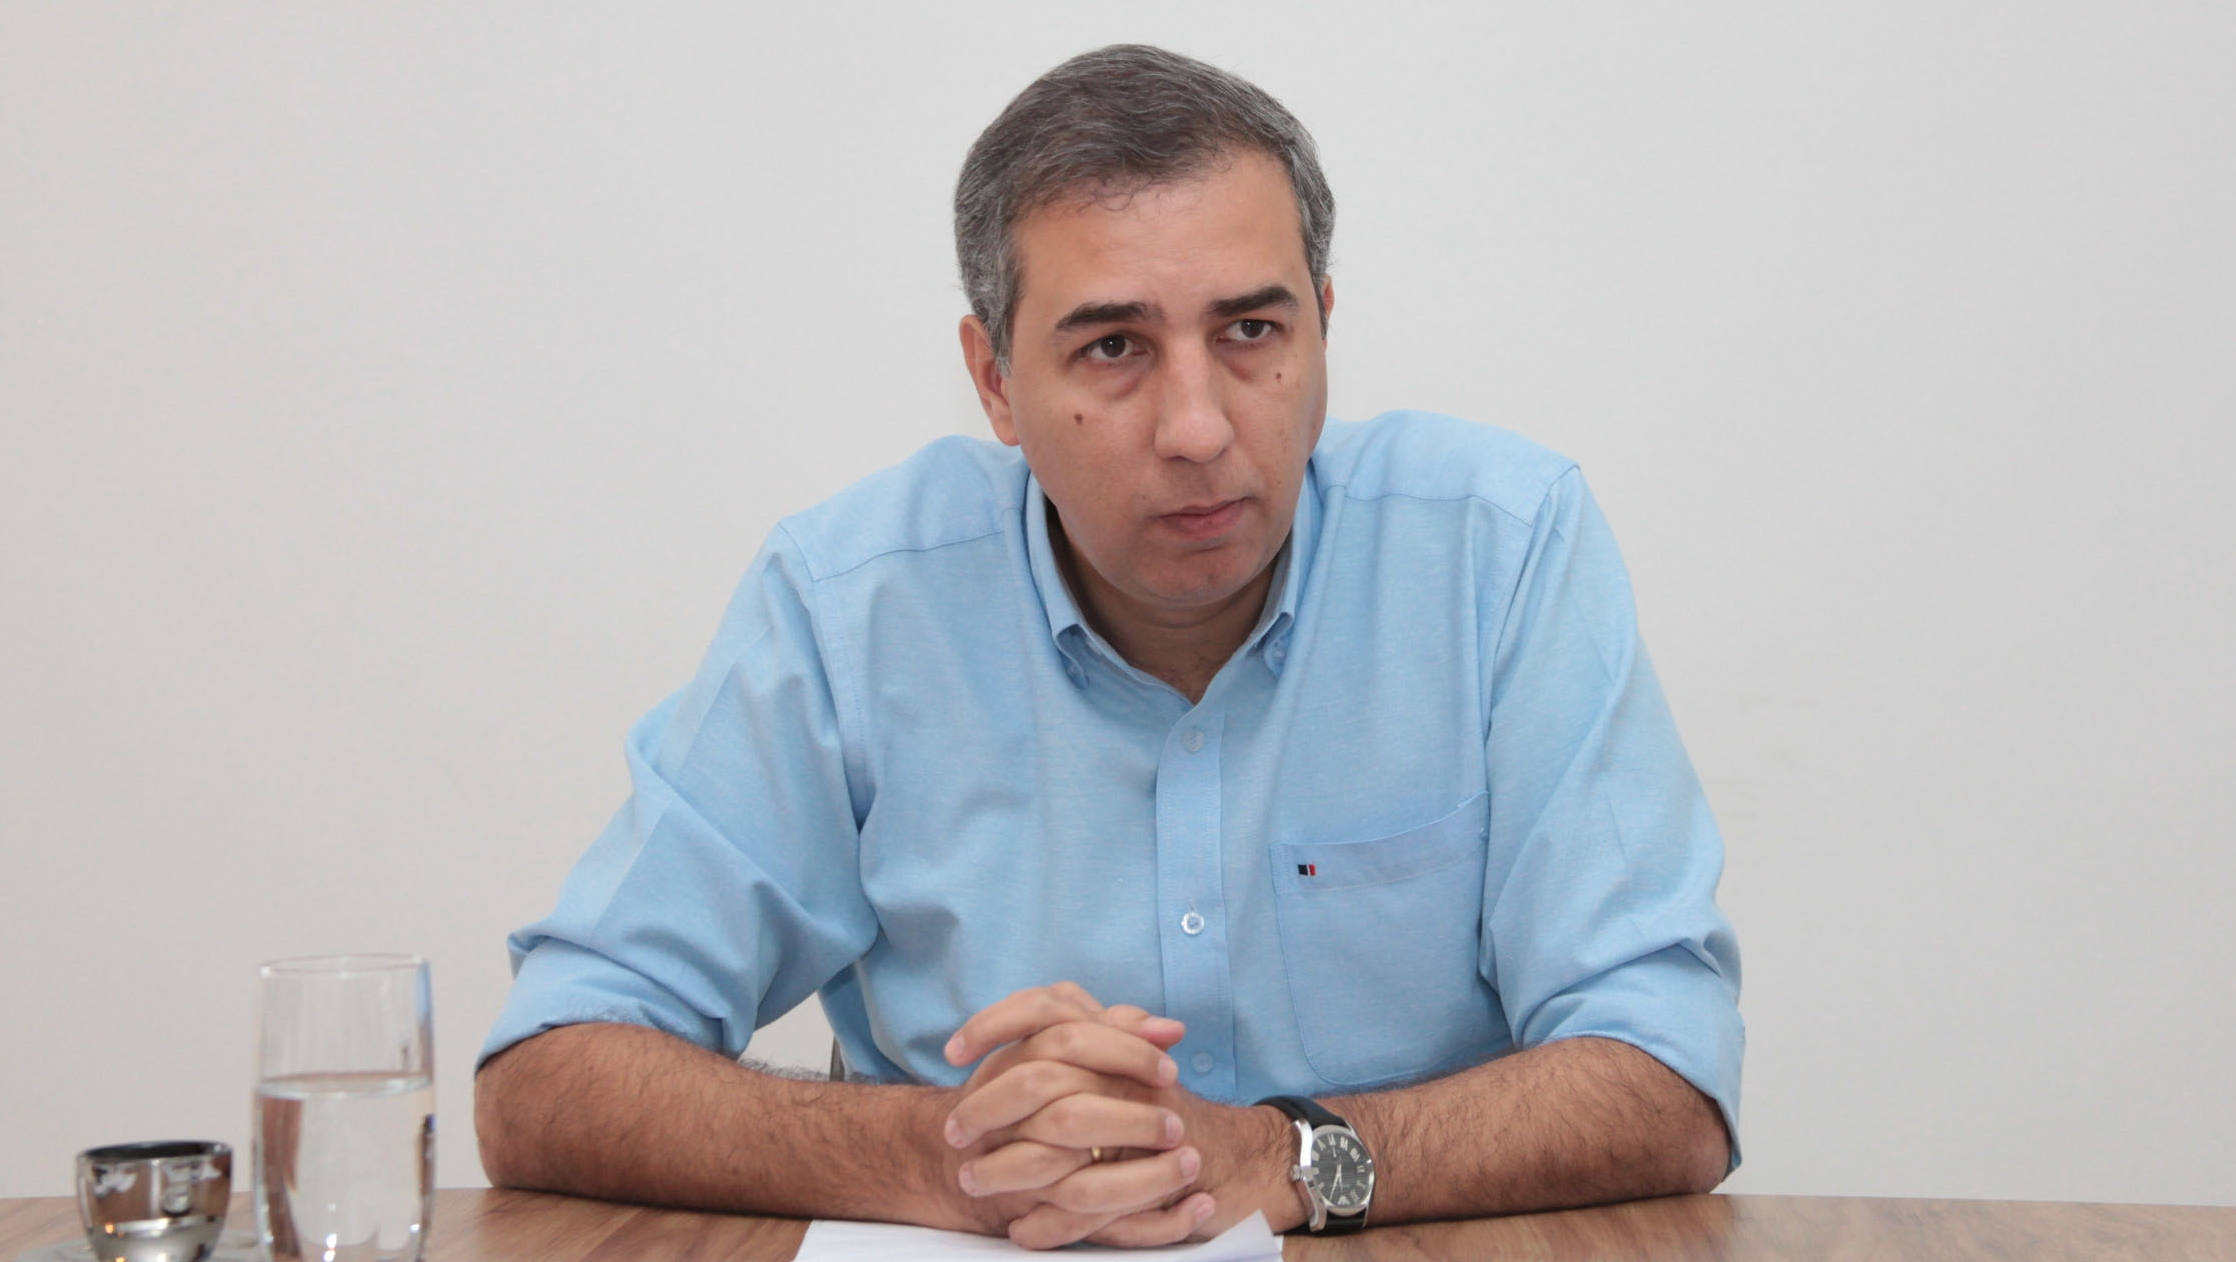 José Eliton participa do velório de Thomaz Alckmin